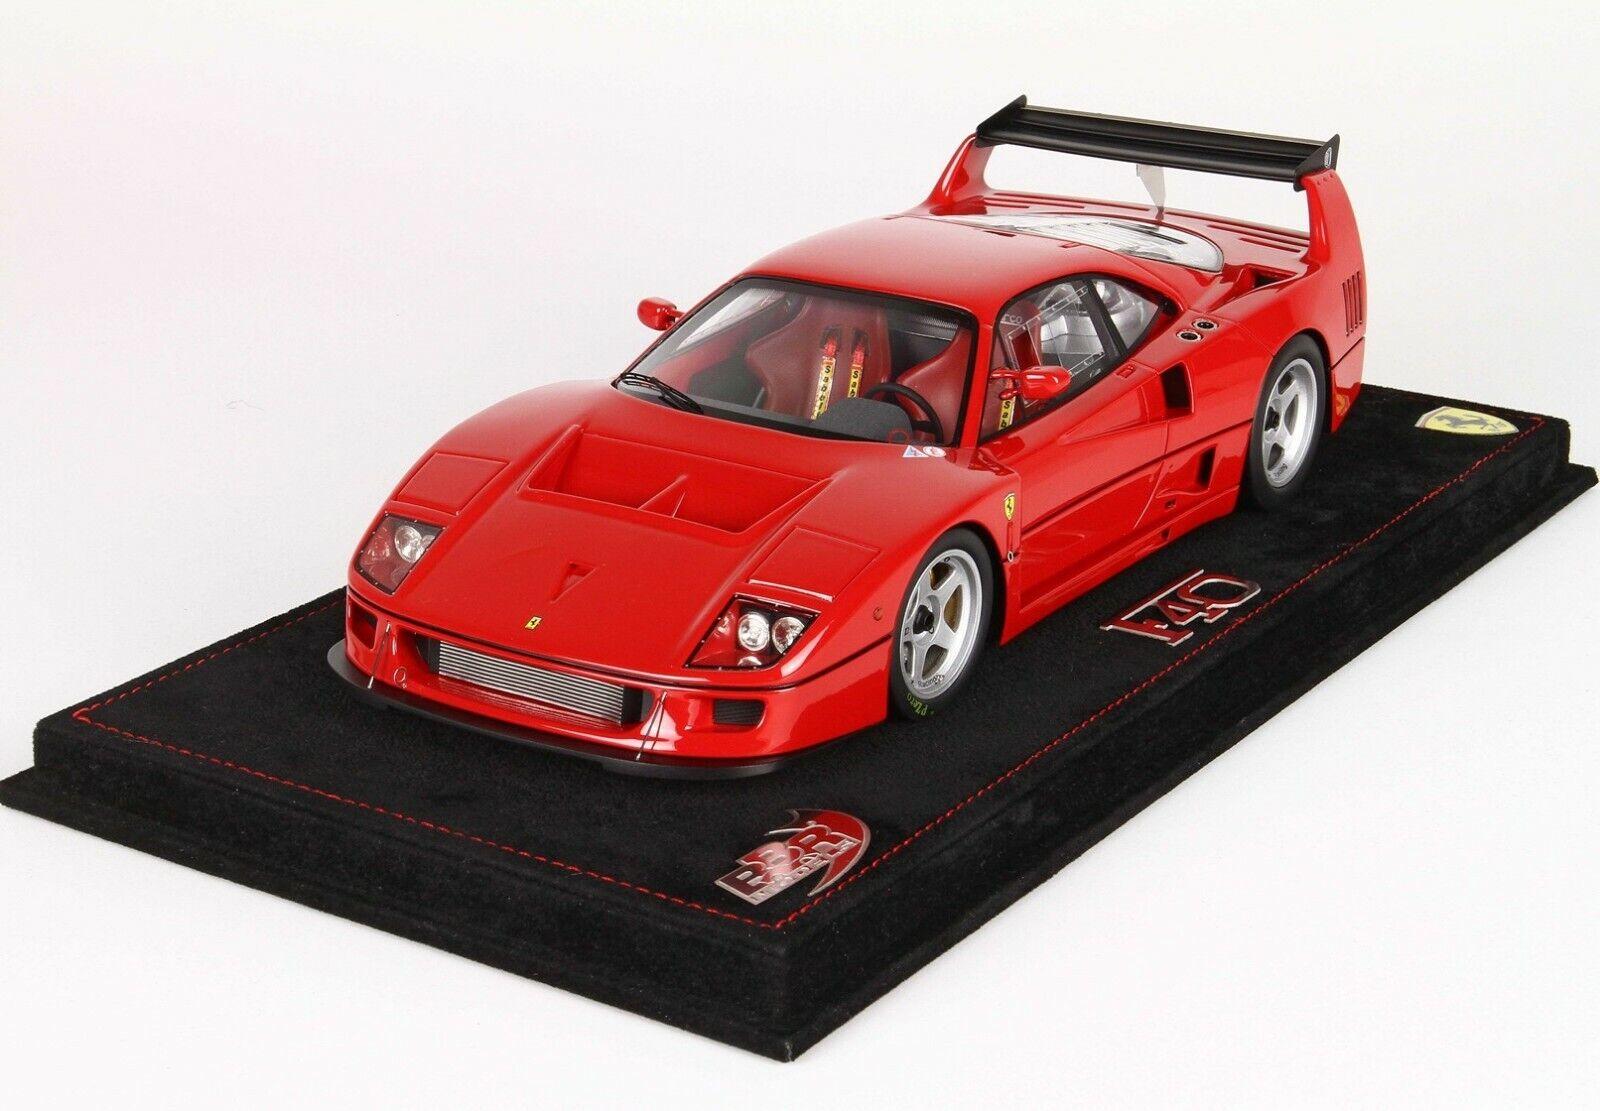 BBR Ferrari F40 LM (ferrari Red Paint) 1 18 P18139A Brand New  SUPER NICE